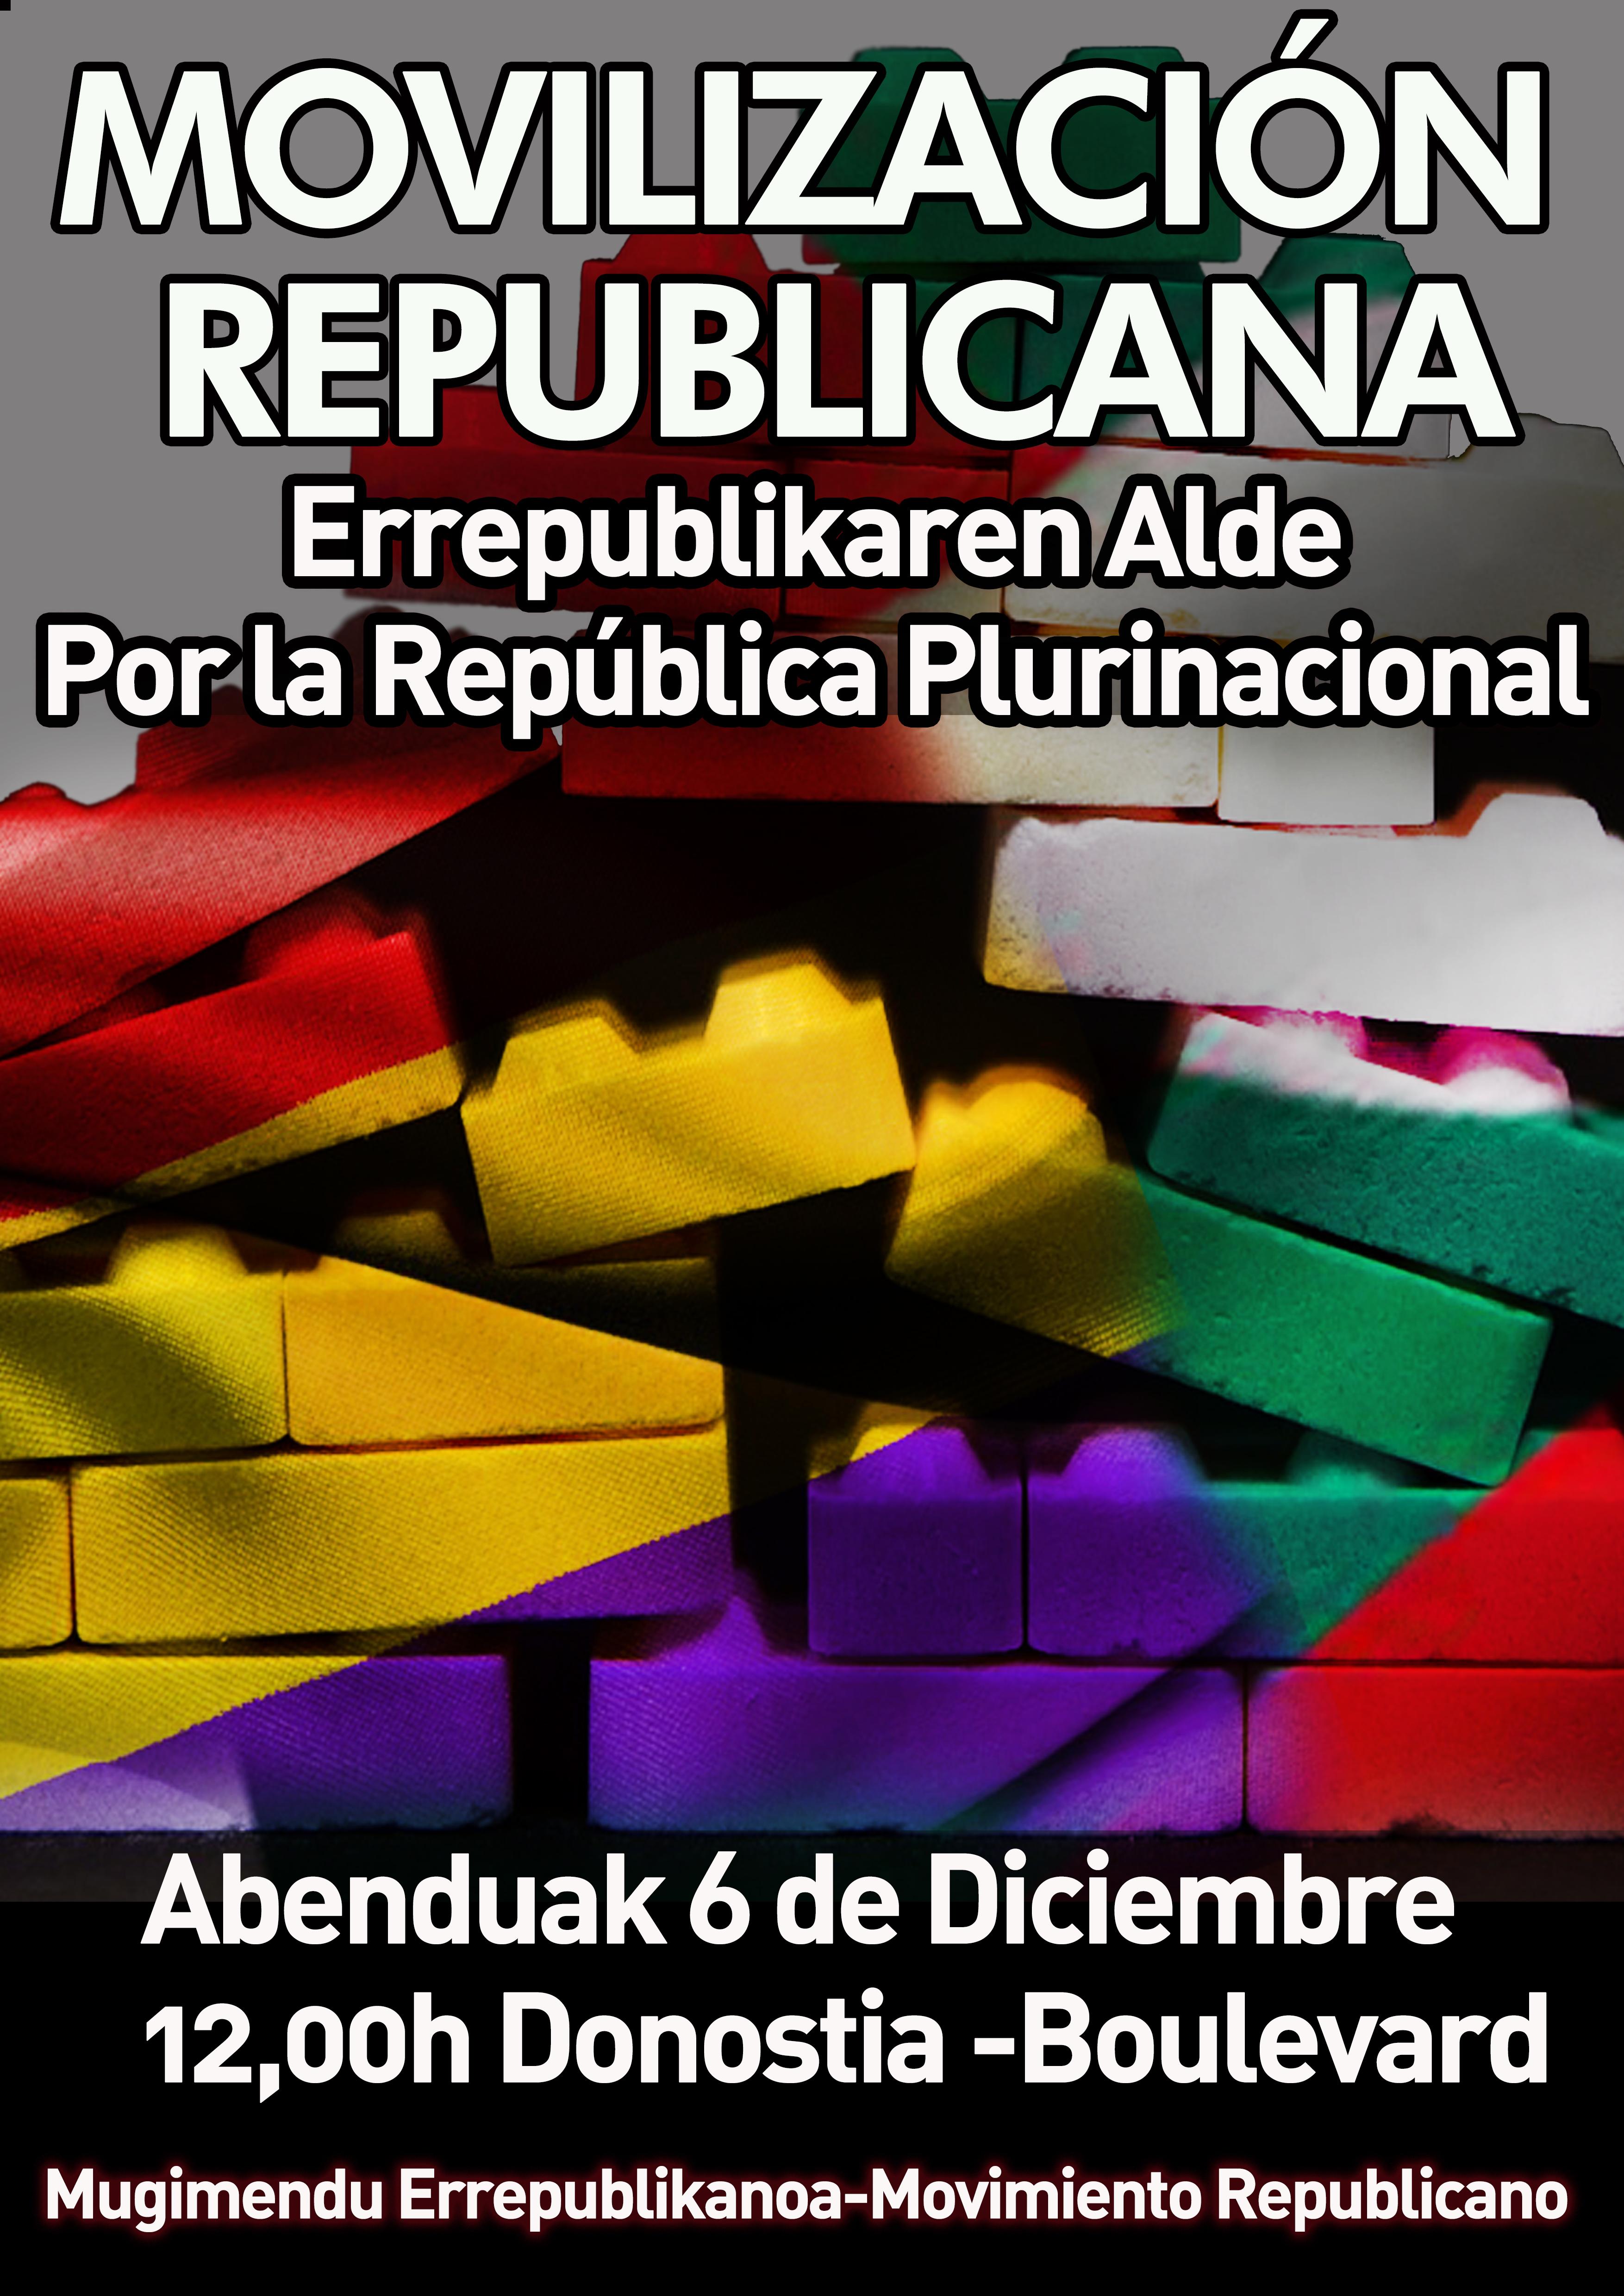 Mobilizazio errepublikanoa abenduaren 6an   Movilización republicana el 6 de Diciembre